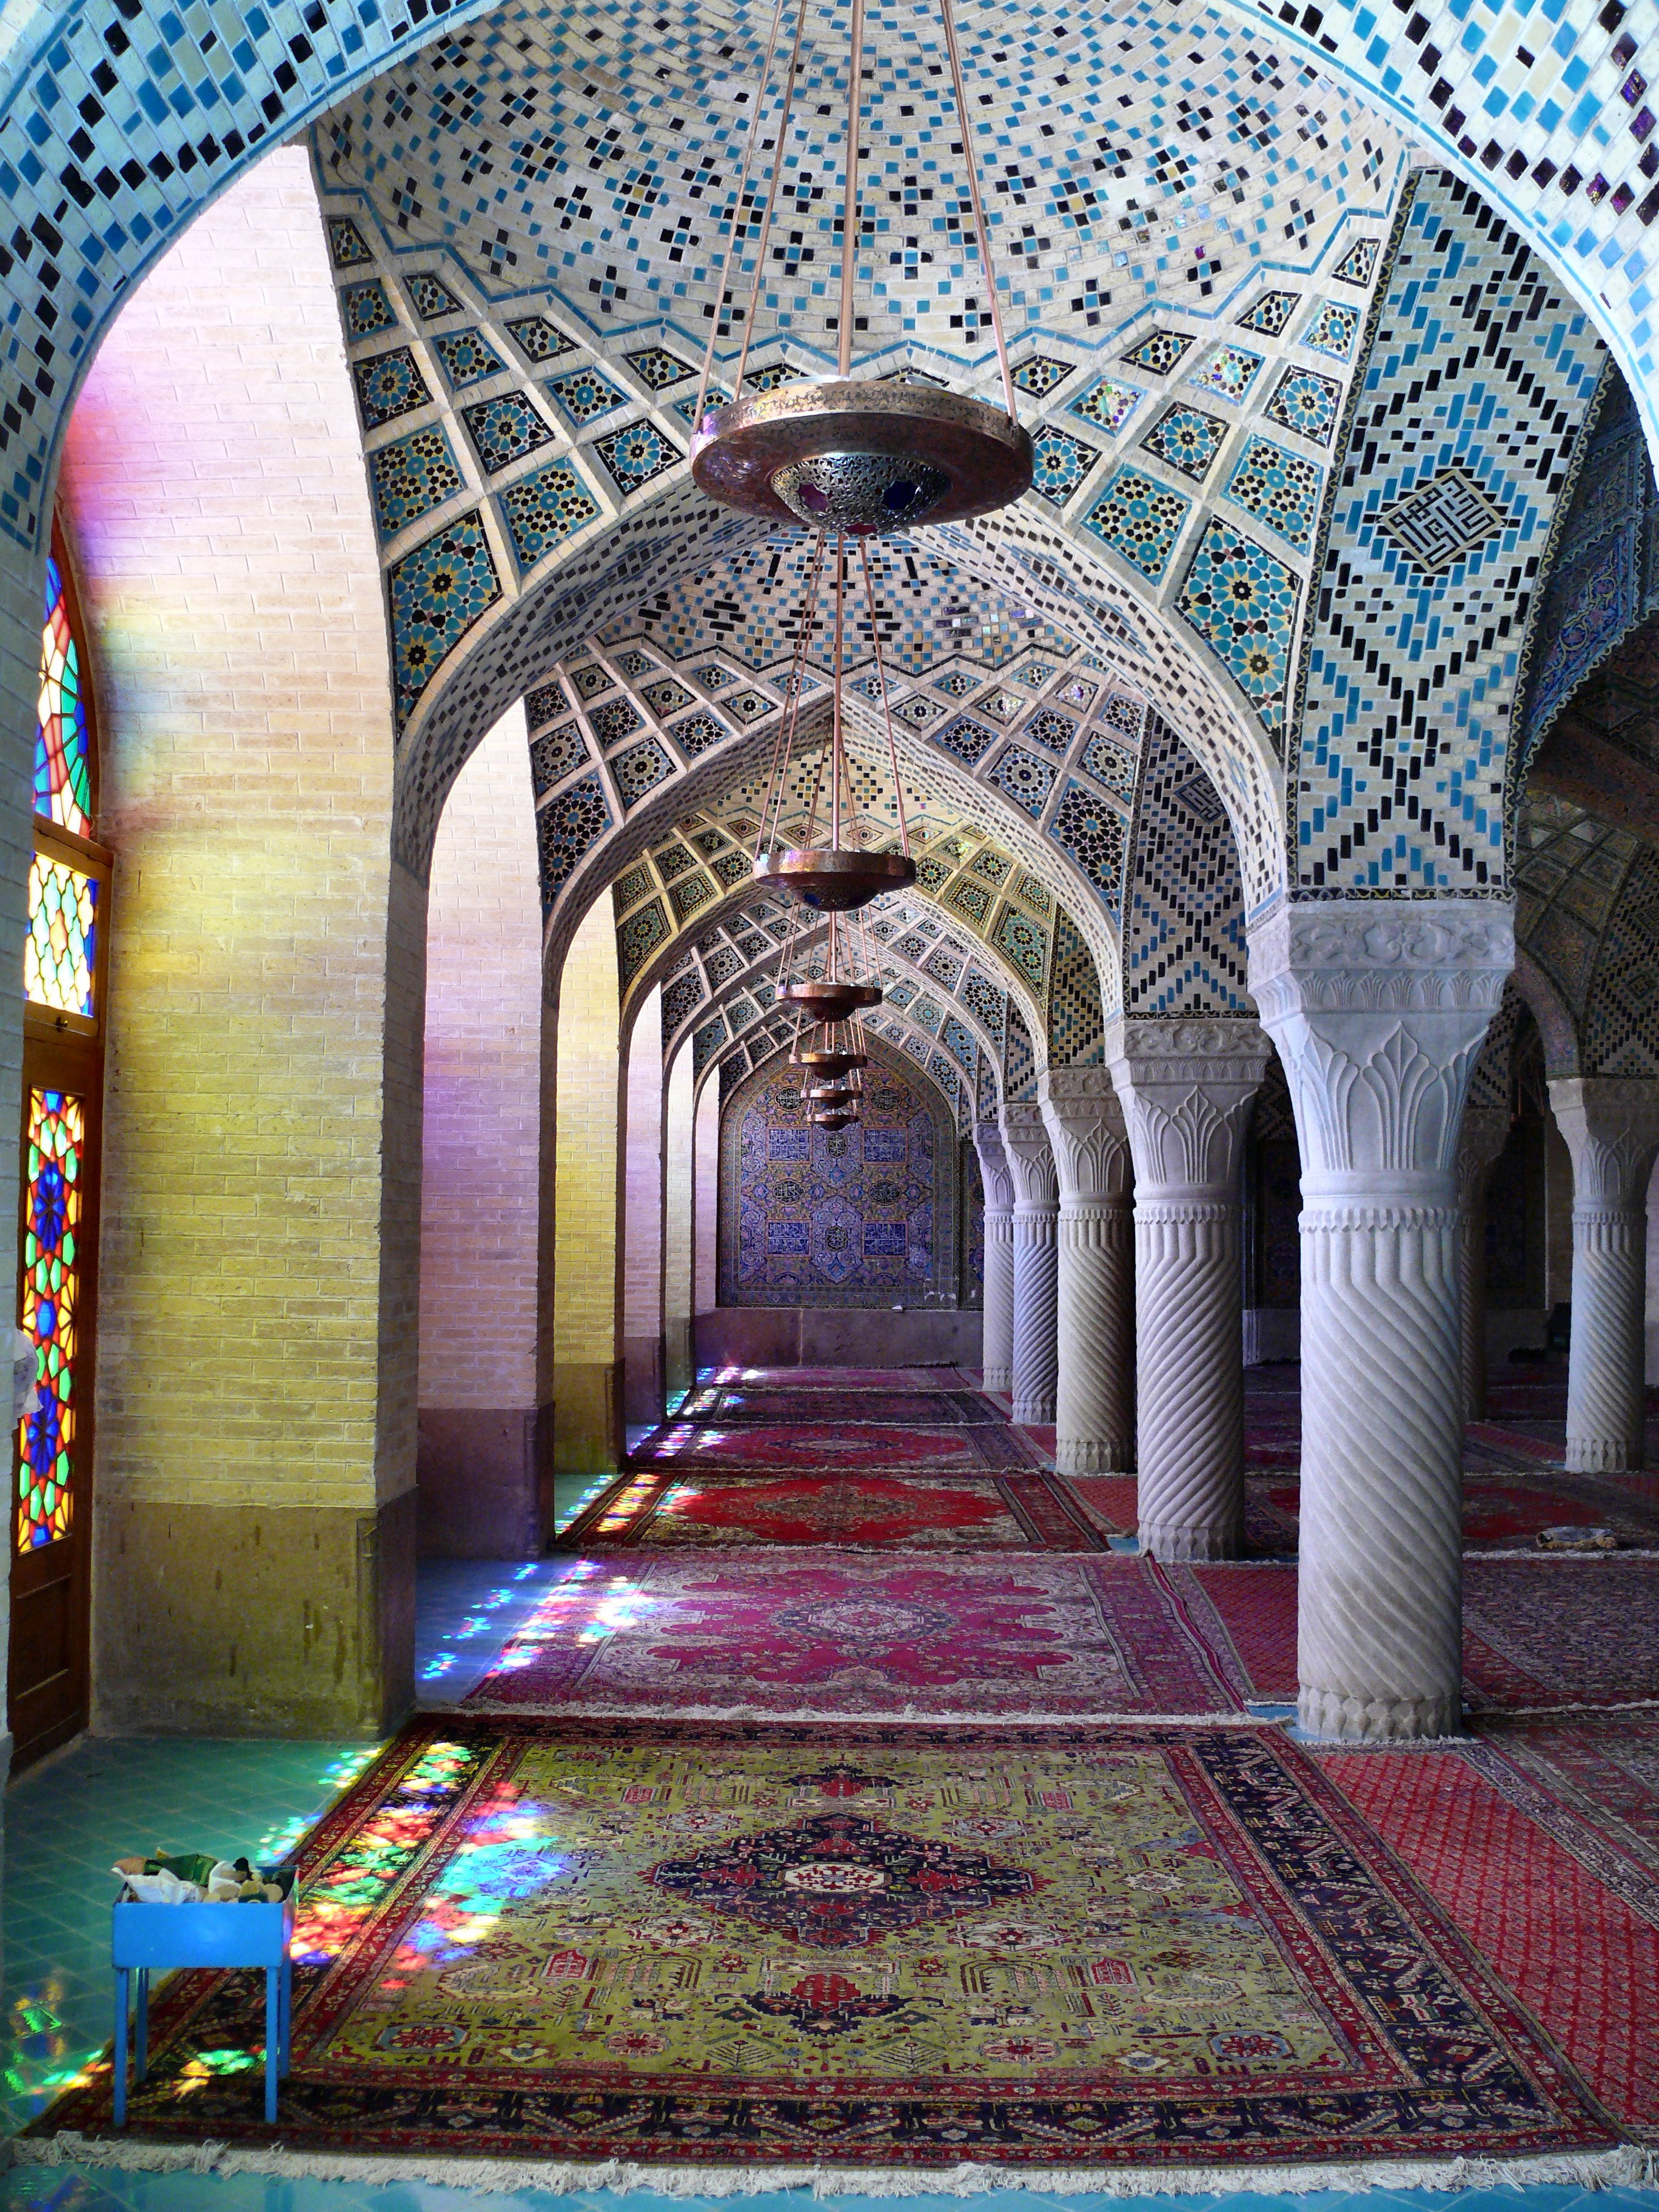 File:Nasr ol Molk mosque inside colorful.jpg - Wikimedia ...